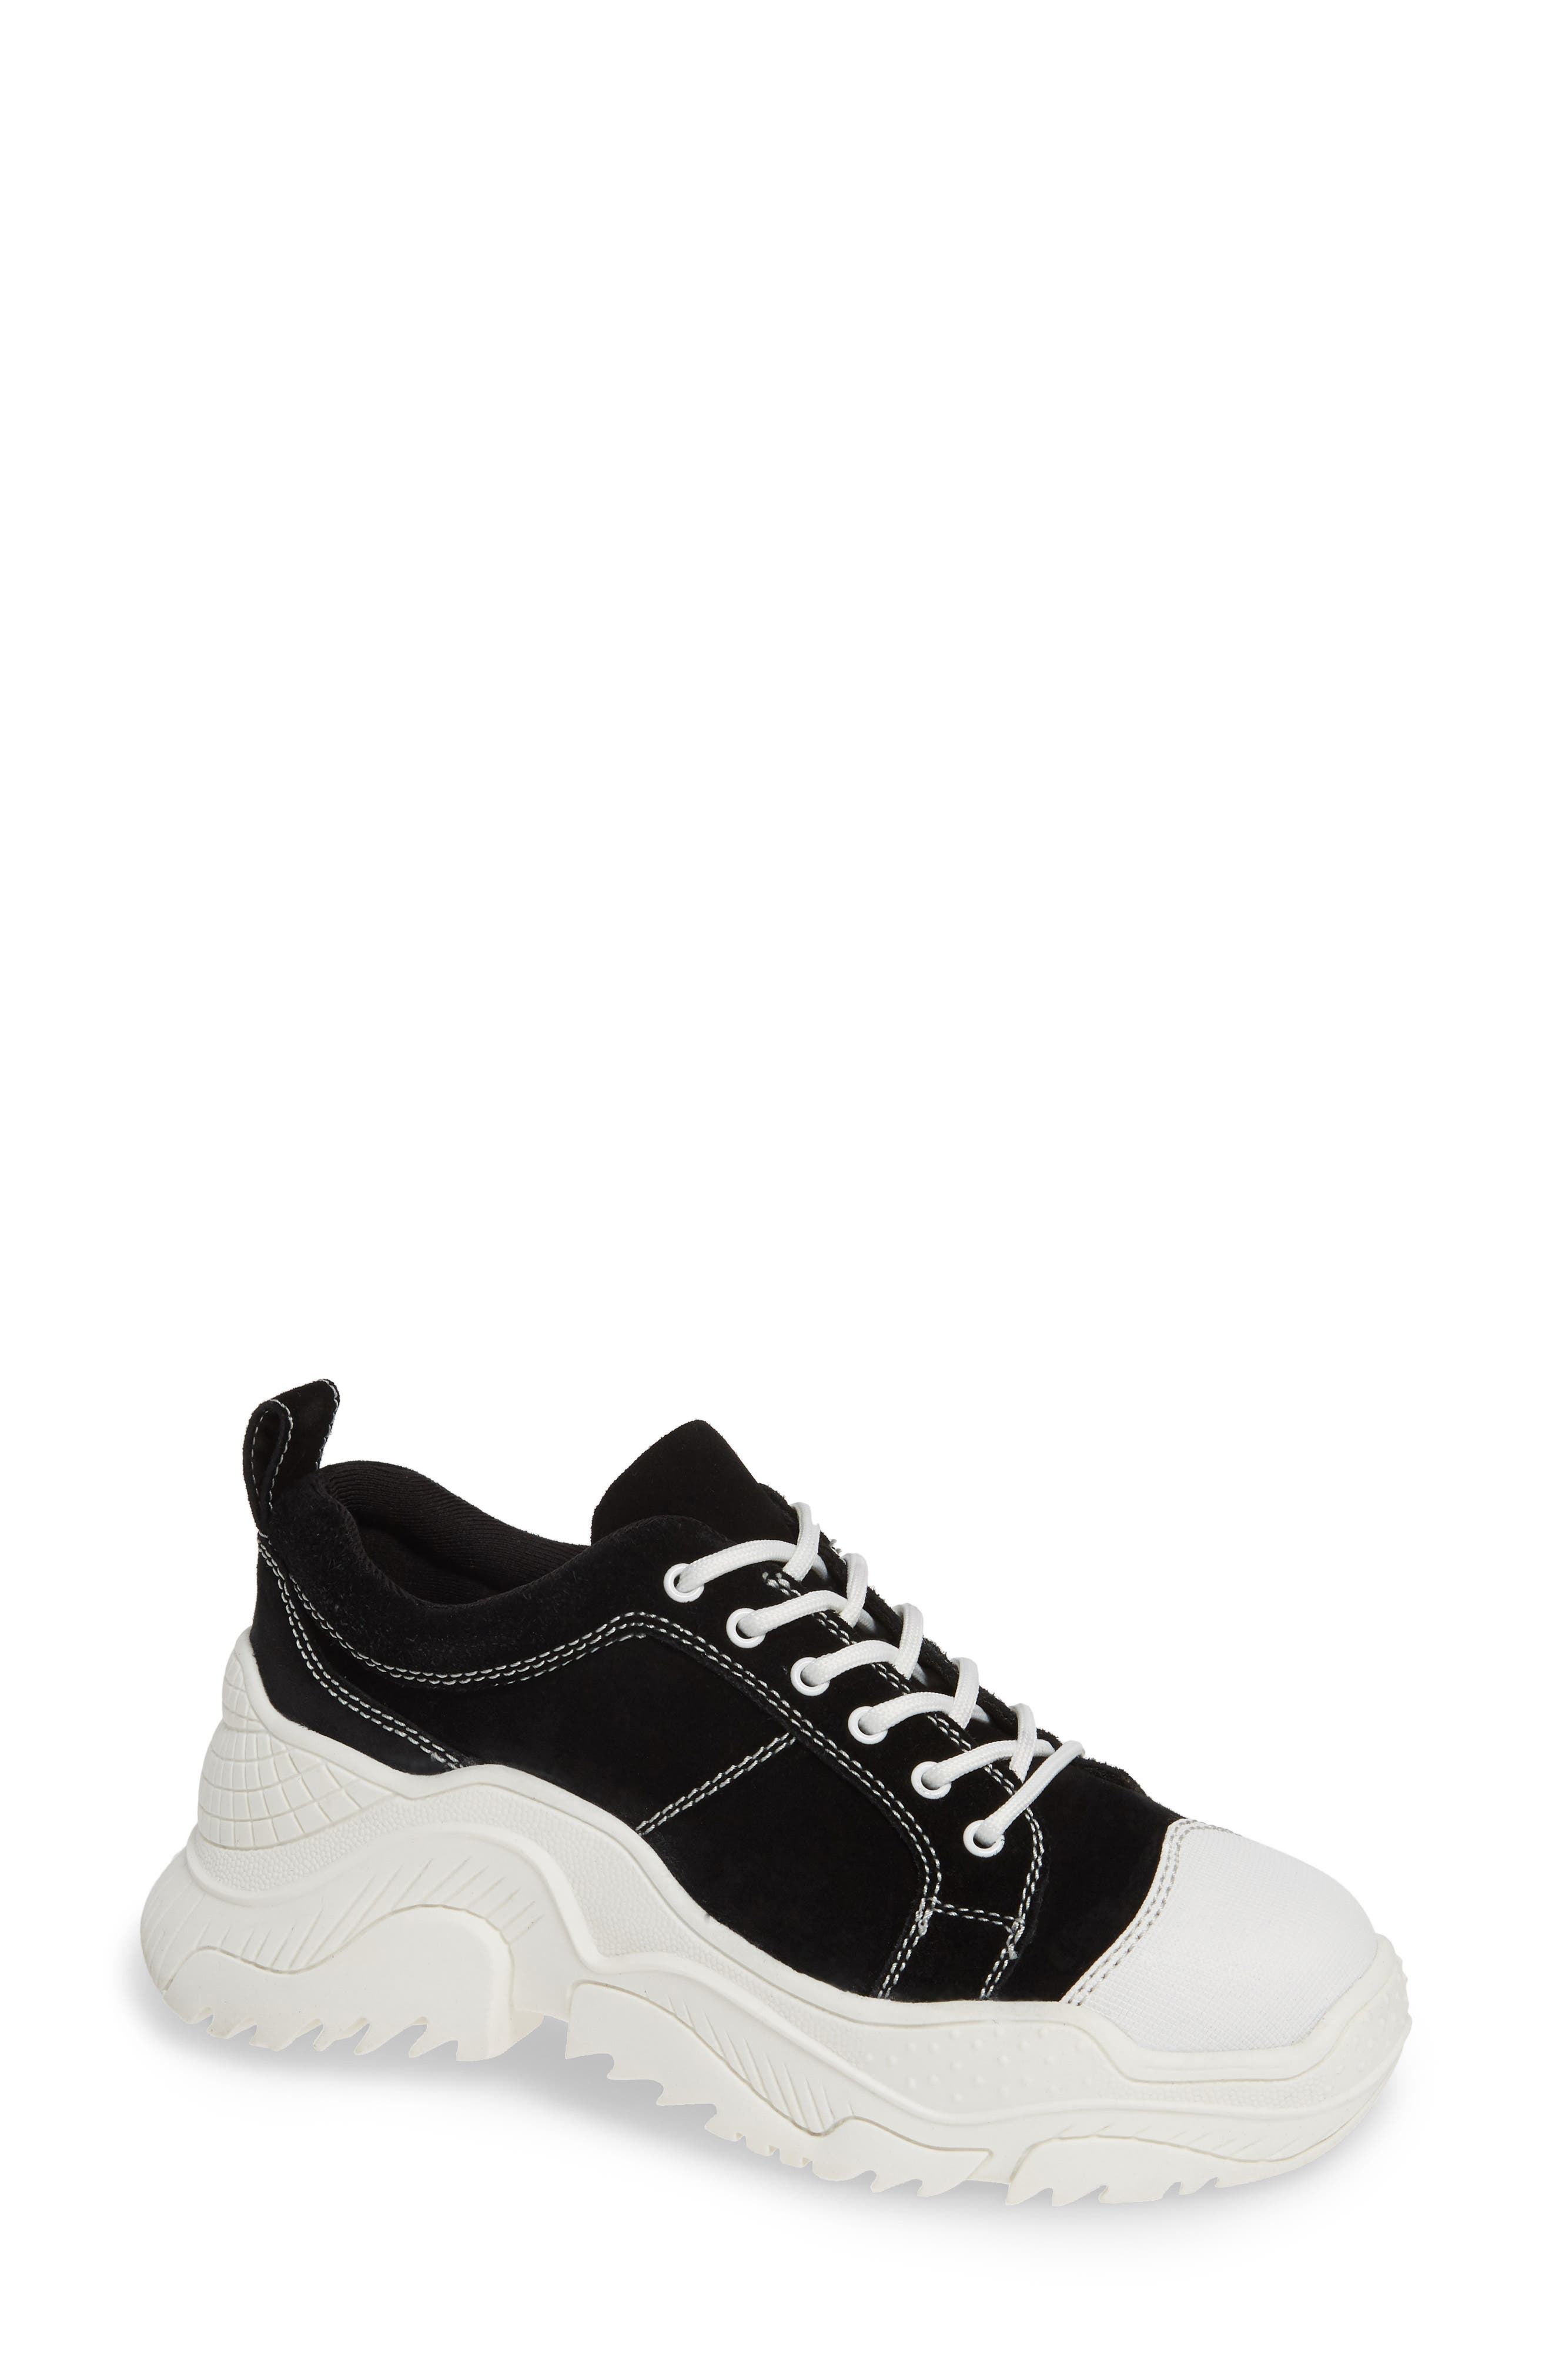 JEFFREY CAMPBELL,                             Remnant Sneaker,                             Main thumbnail 1, color,                             BLACK SUEDE WHITE